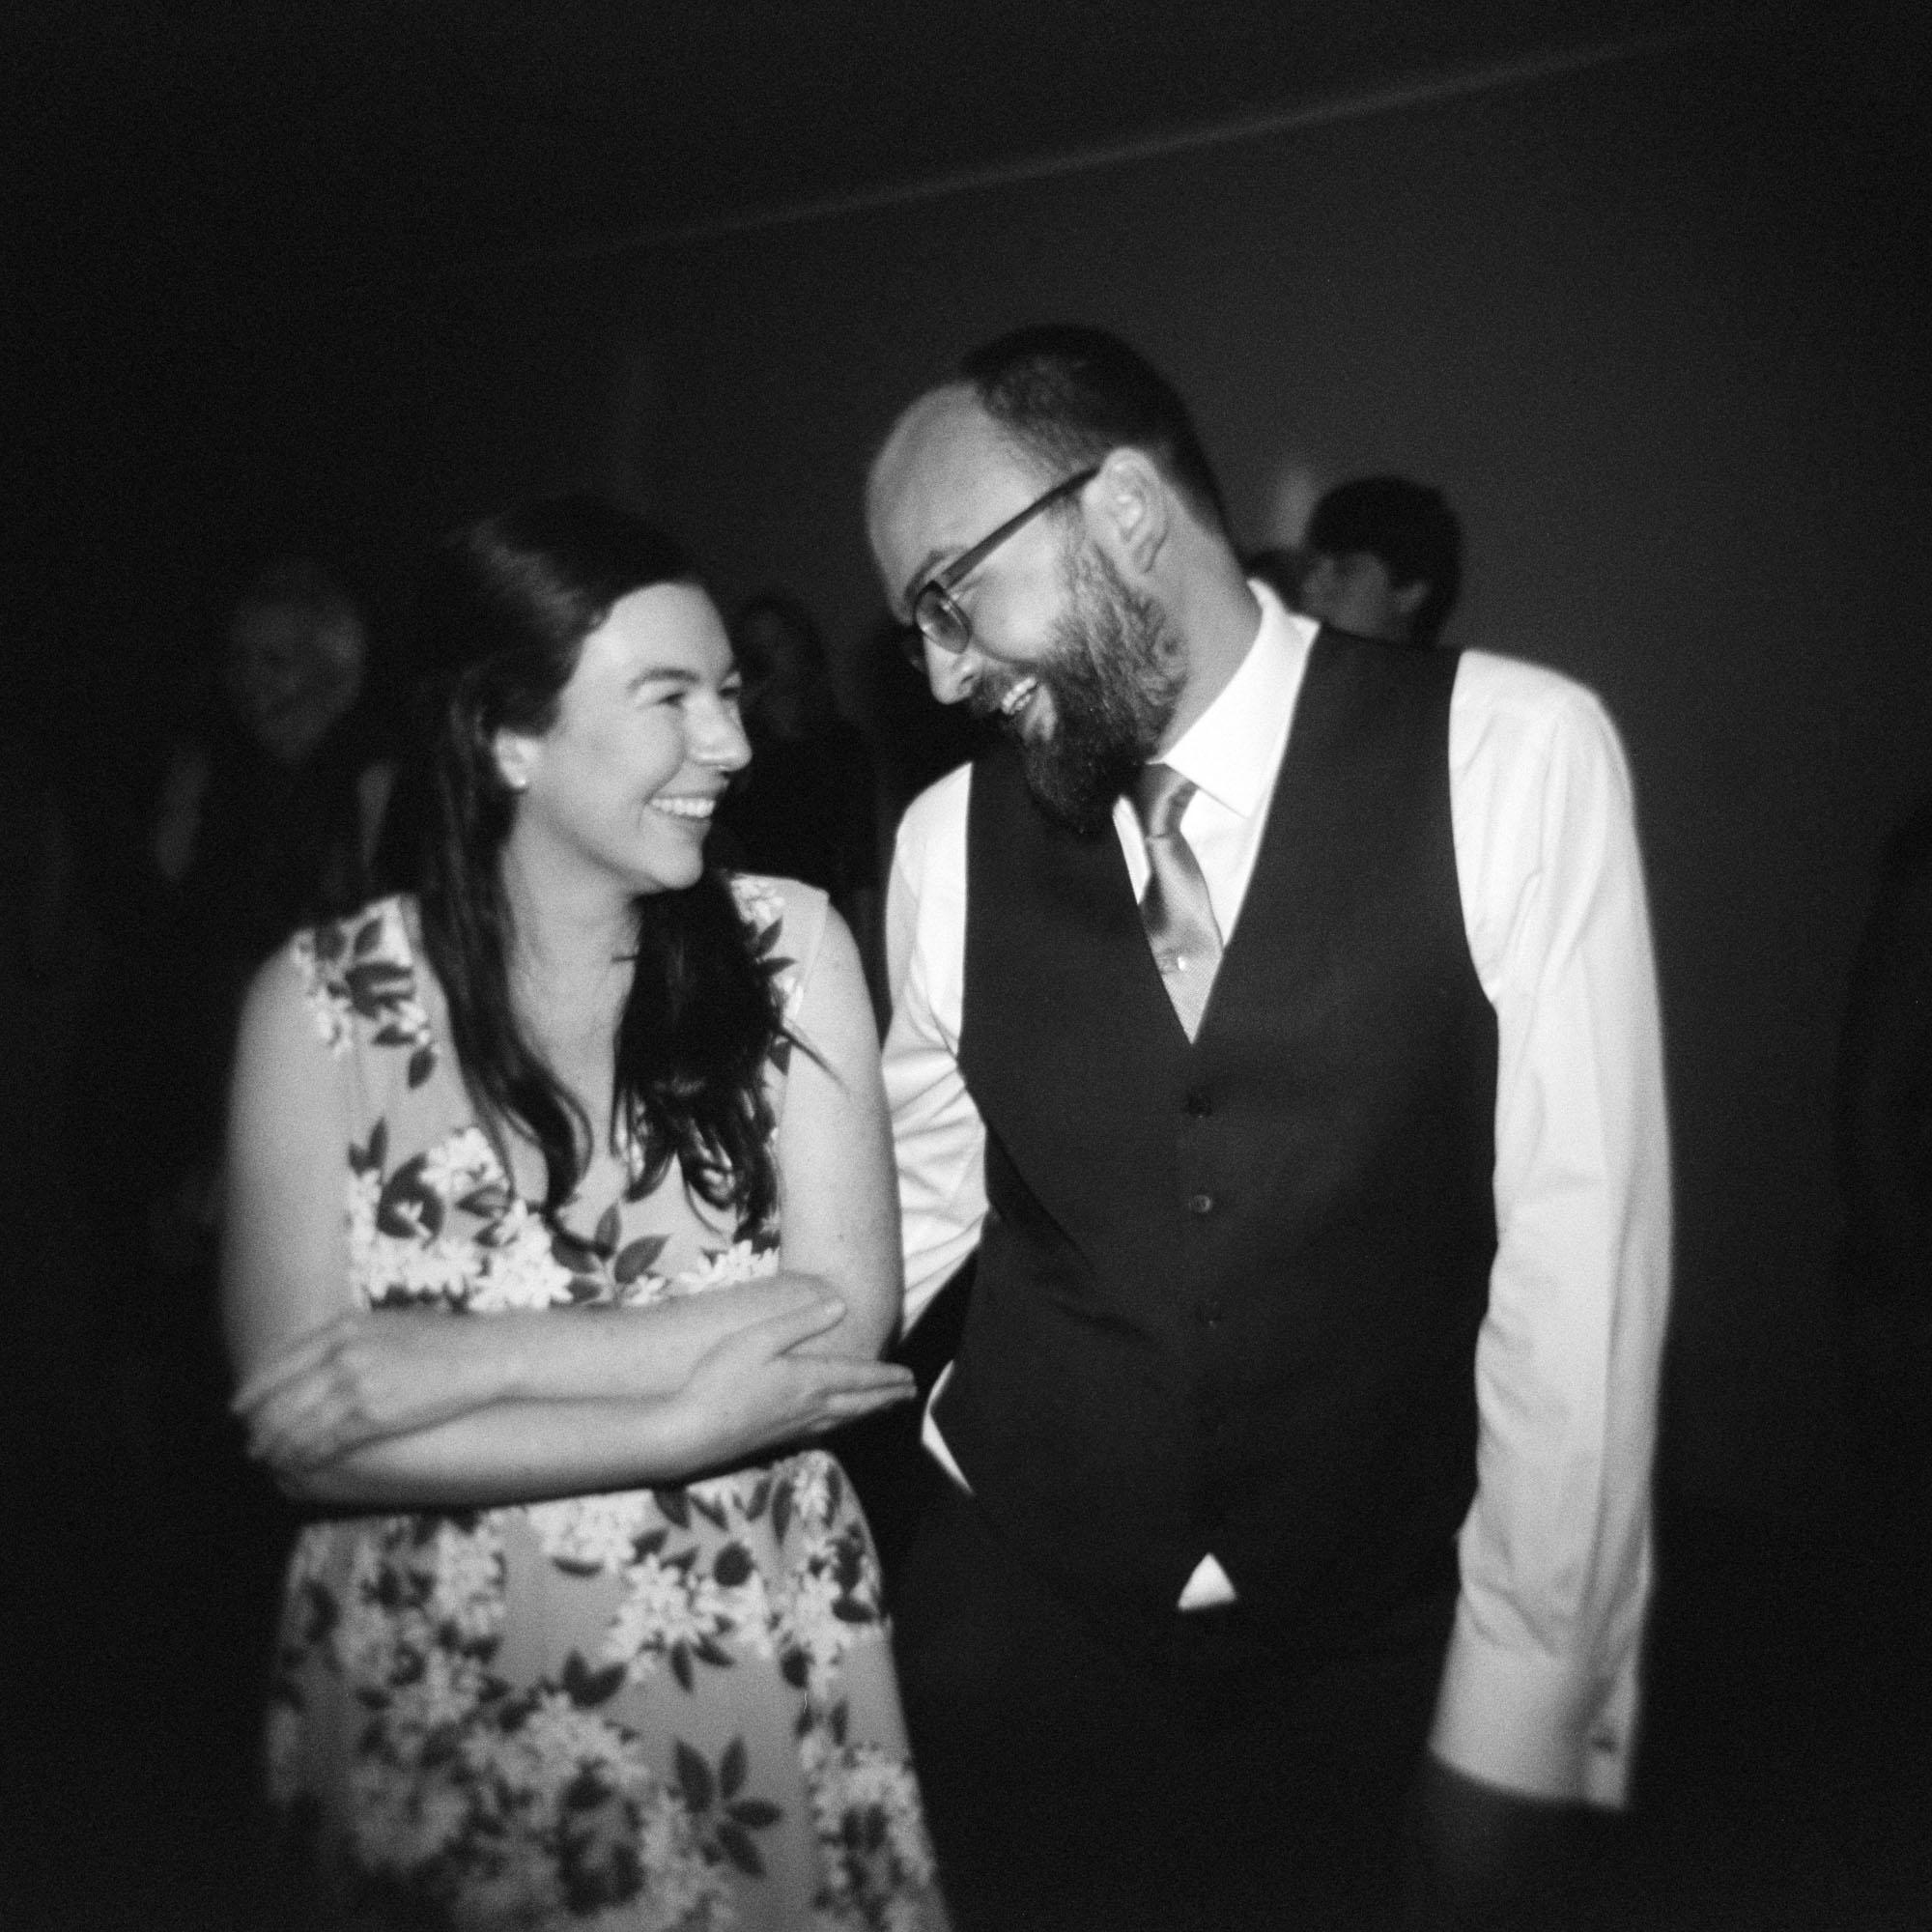 Glen-Ewin-Estate-wedding-photography-109.jpg